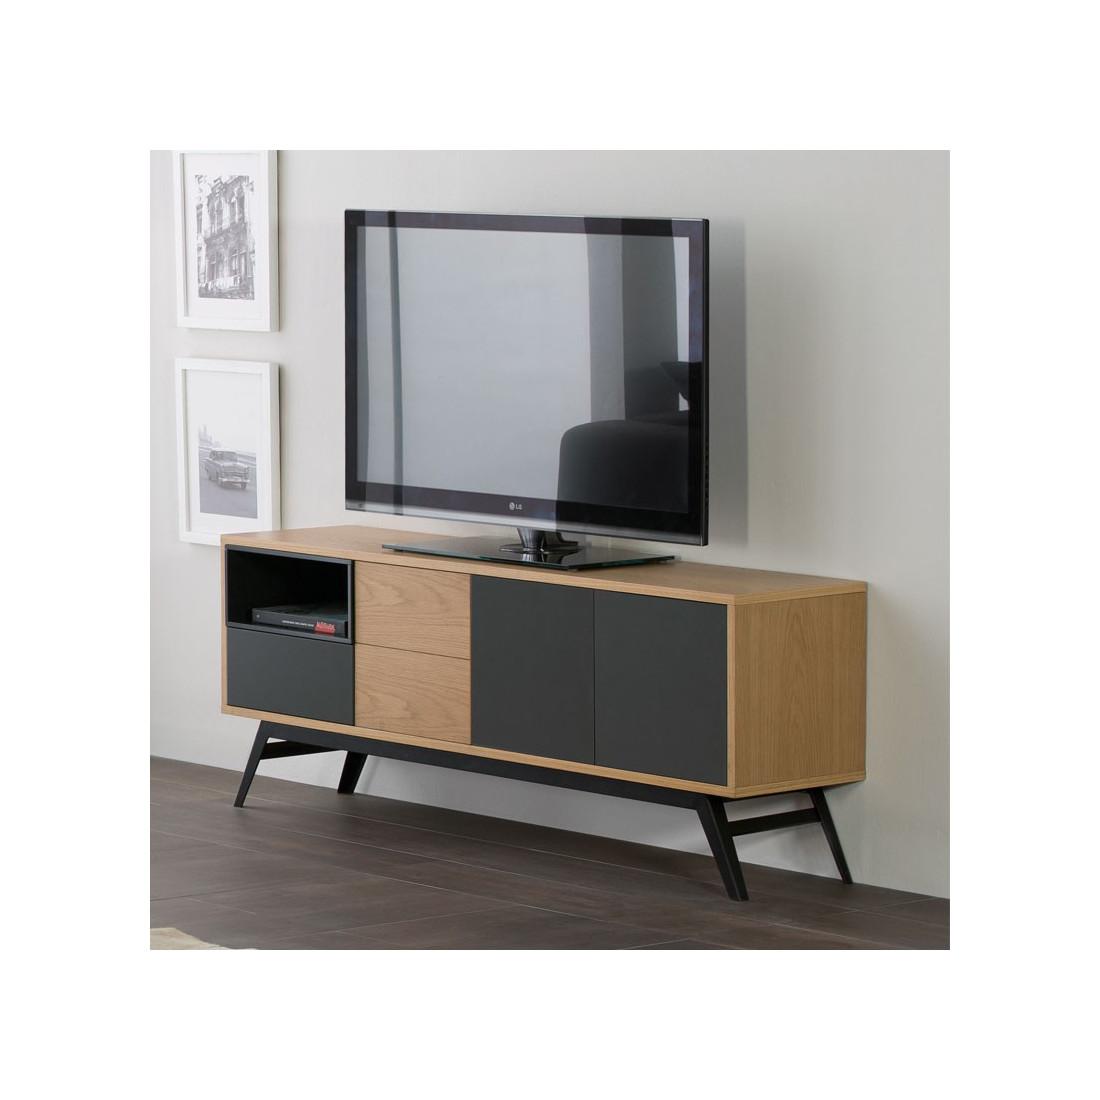 Meuble tv 3 portes 1 tiroir scandinave alesia univers du for Meuble tiroir salon